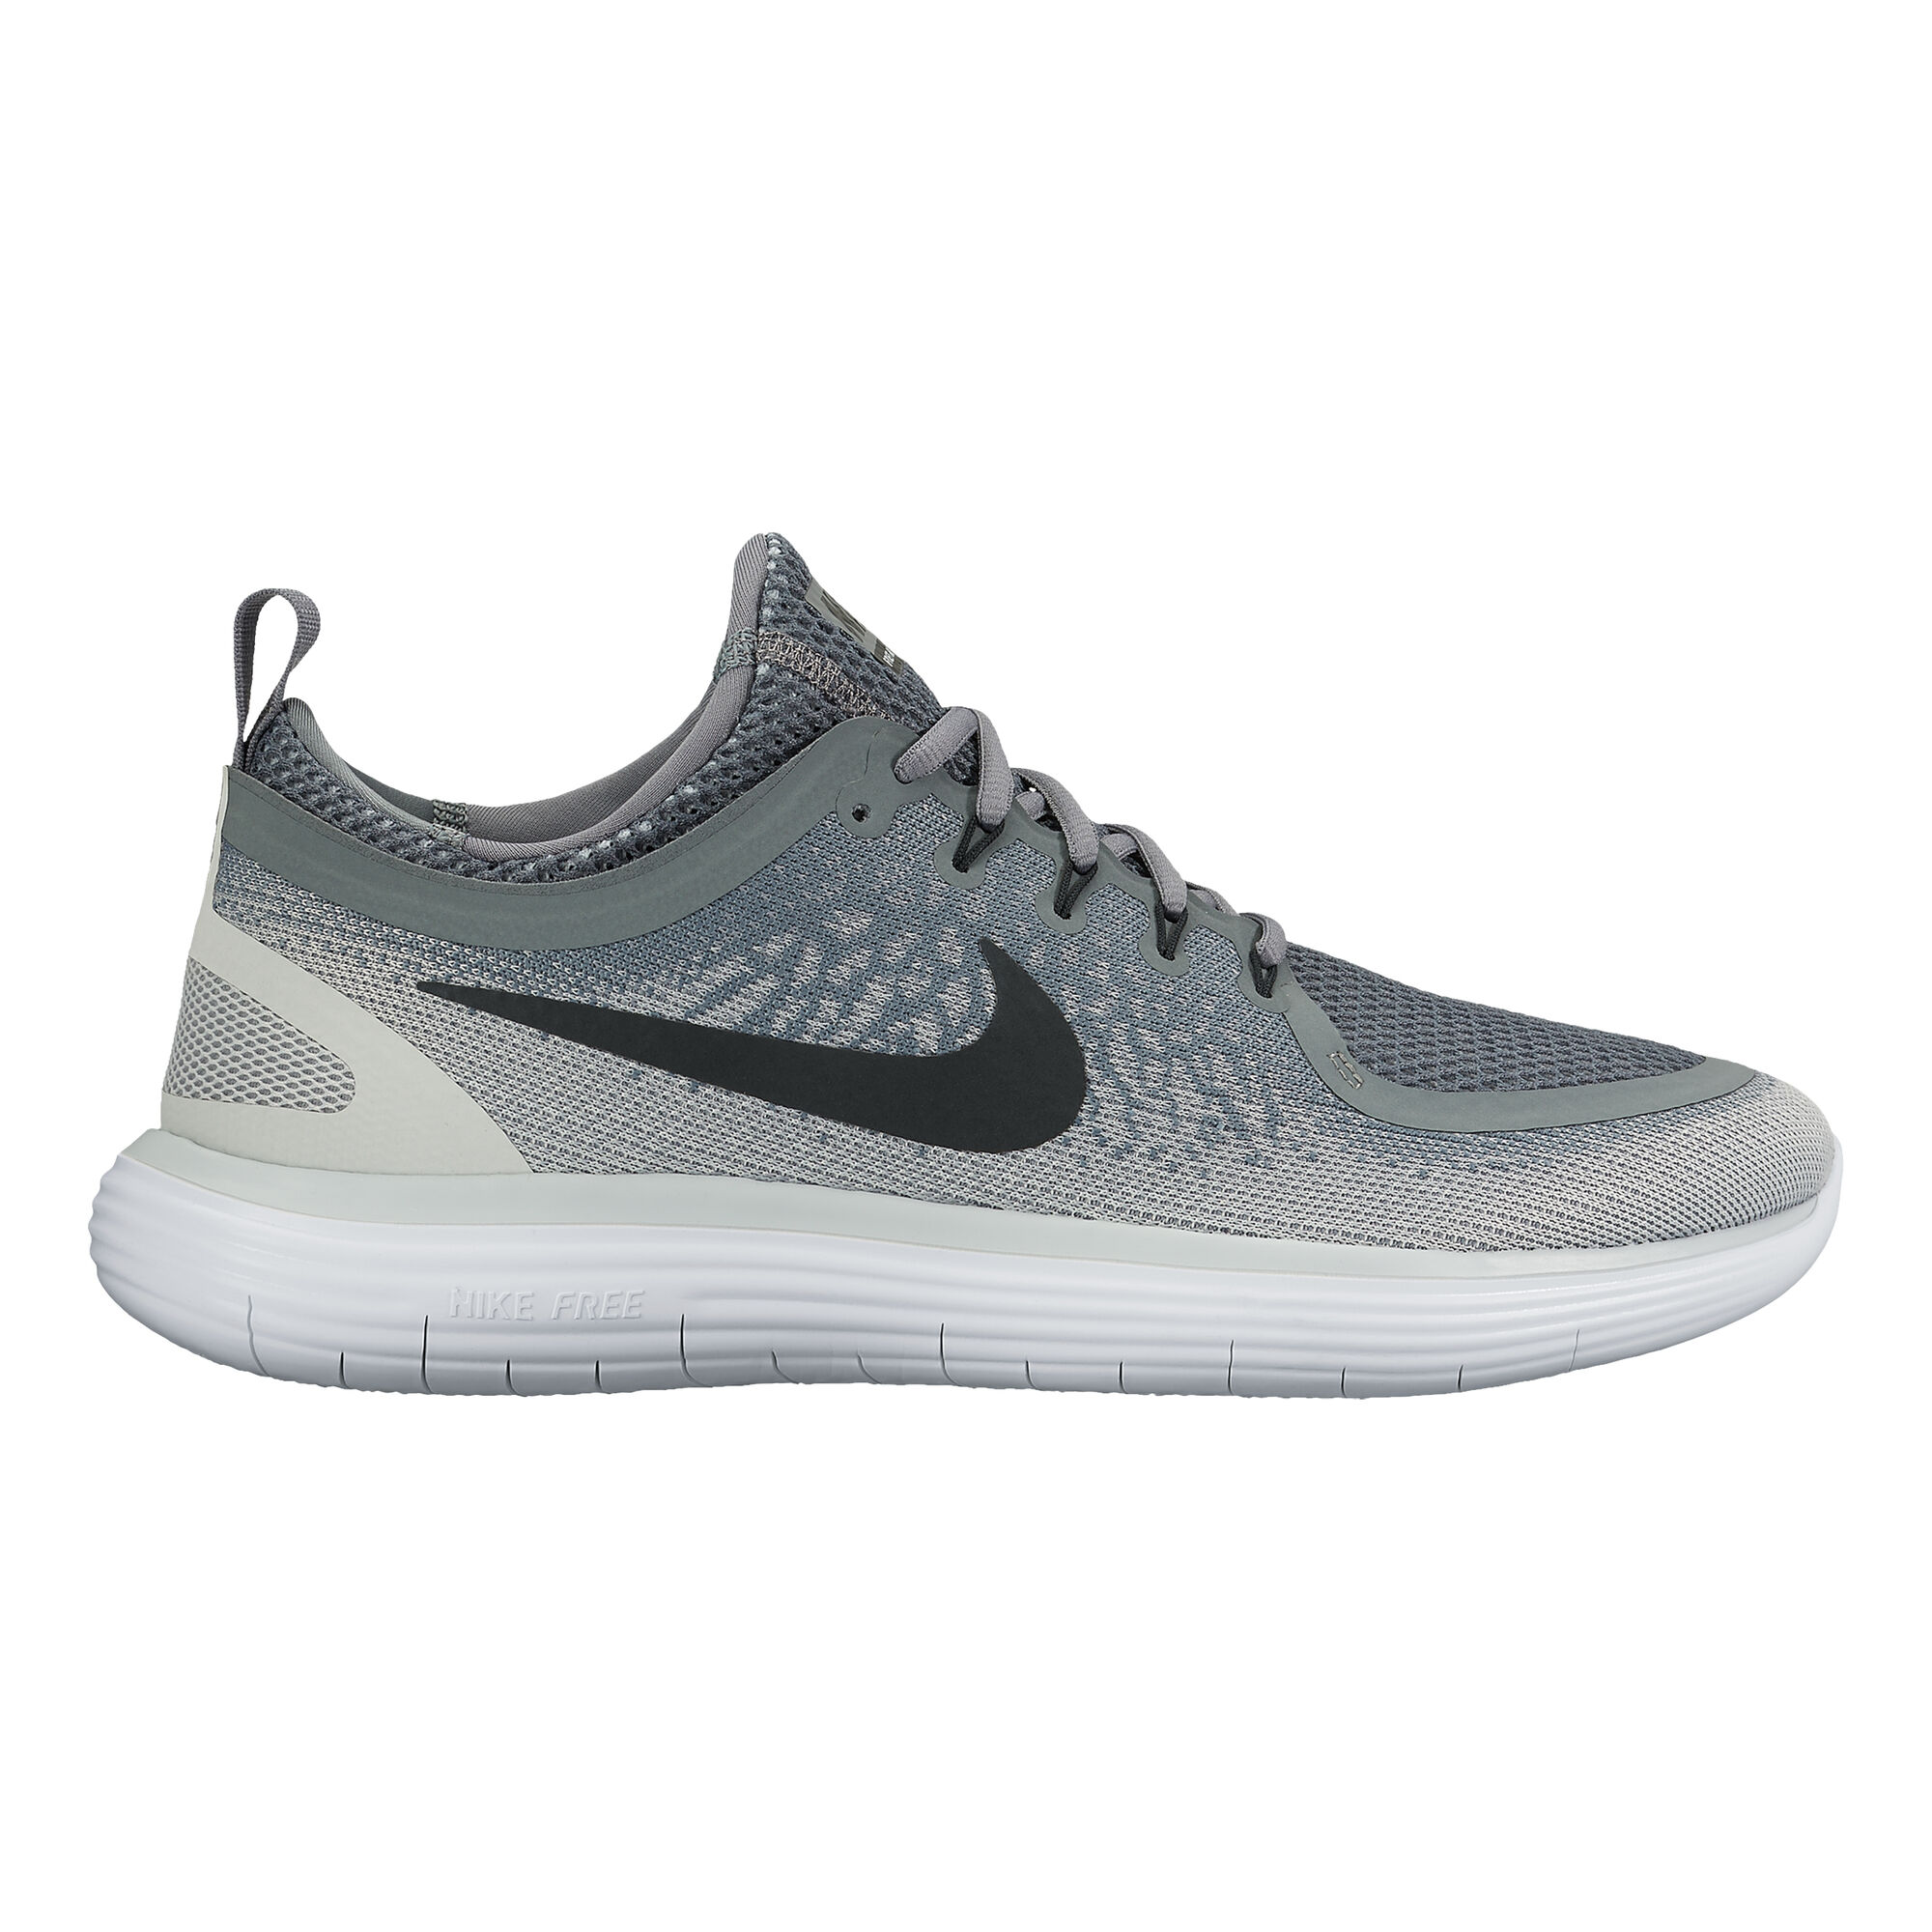 5b381732ca6b buy Nike Free Run Distance 2 Natural Running Shoe Men - Lightgrey ...